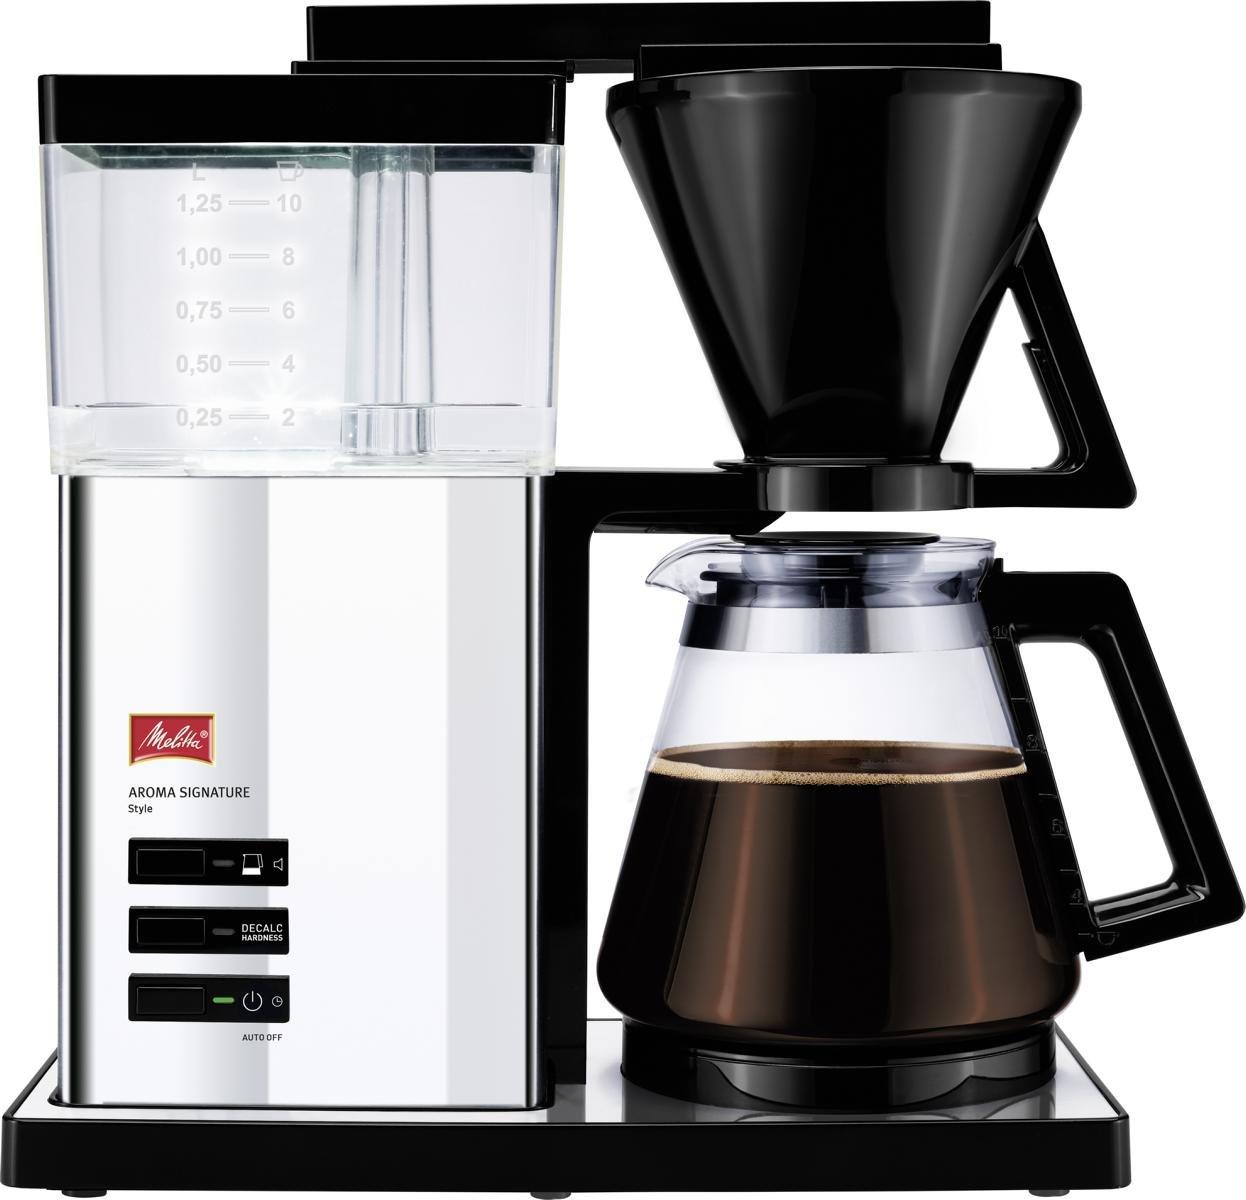 Melitta-100702-Aroma-Signature-De-Luxe-Kaffeefiltermaschine–AromaschalterEdelstahl